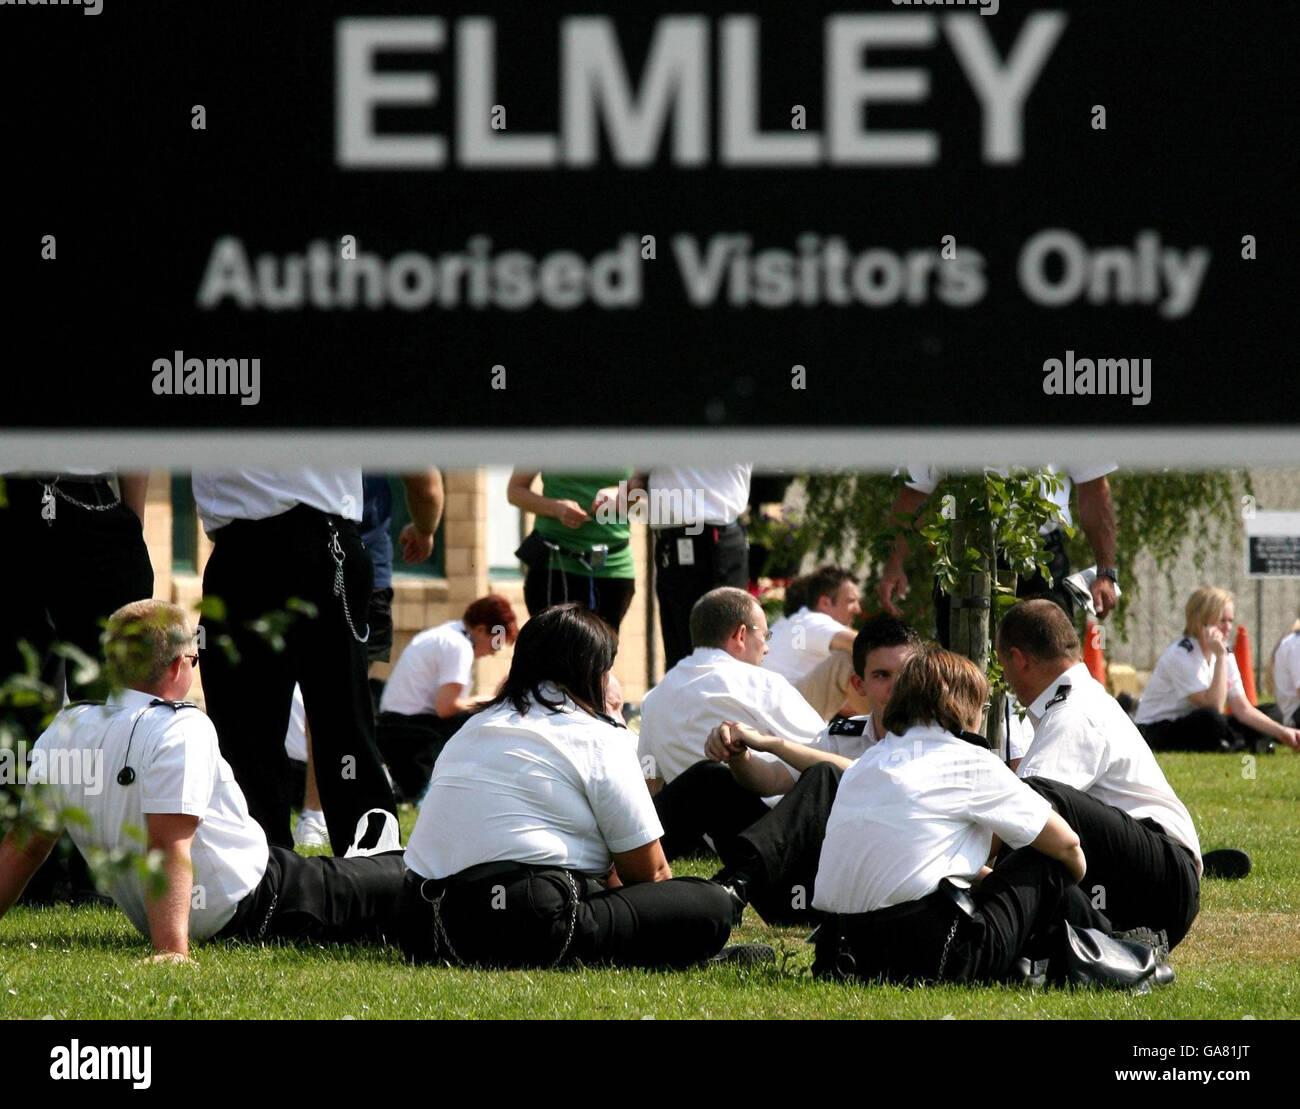 Elmley Prison Stock Photos Elmley Prison Stock Images Alamy